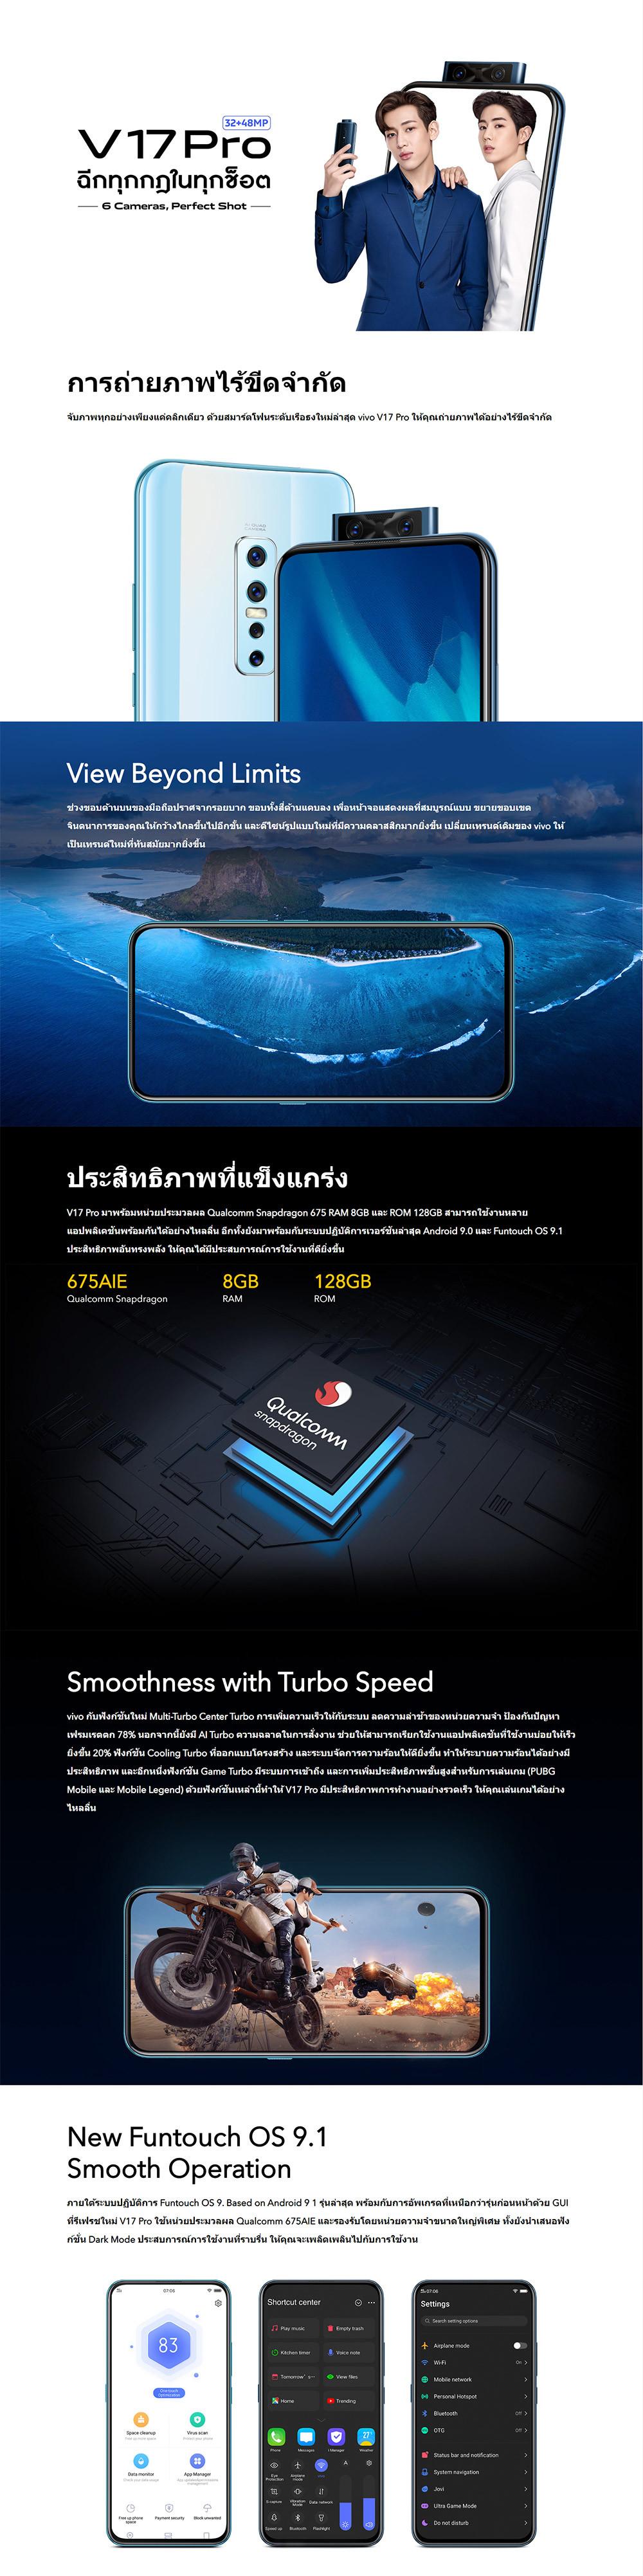 screencapture-vivo-th-products-v17pro-20